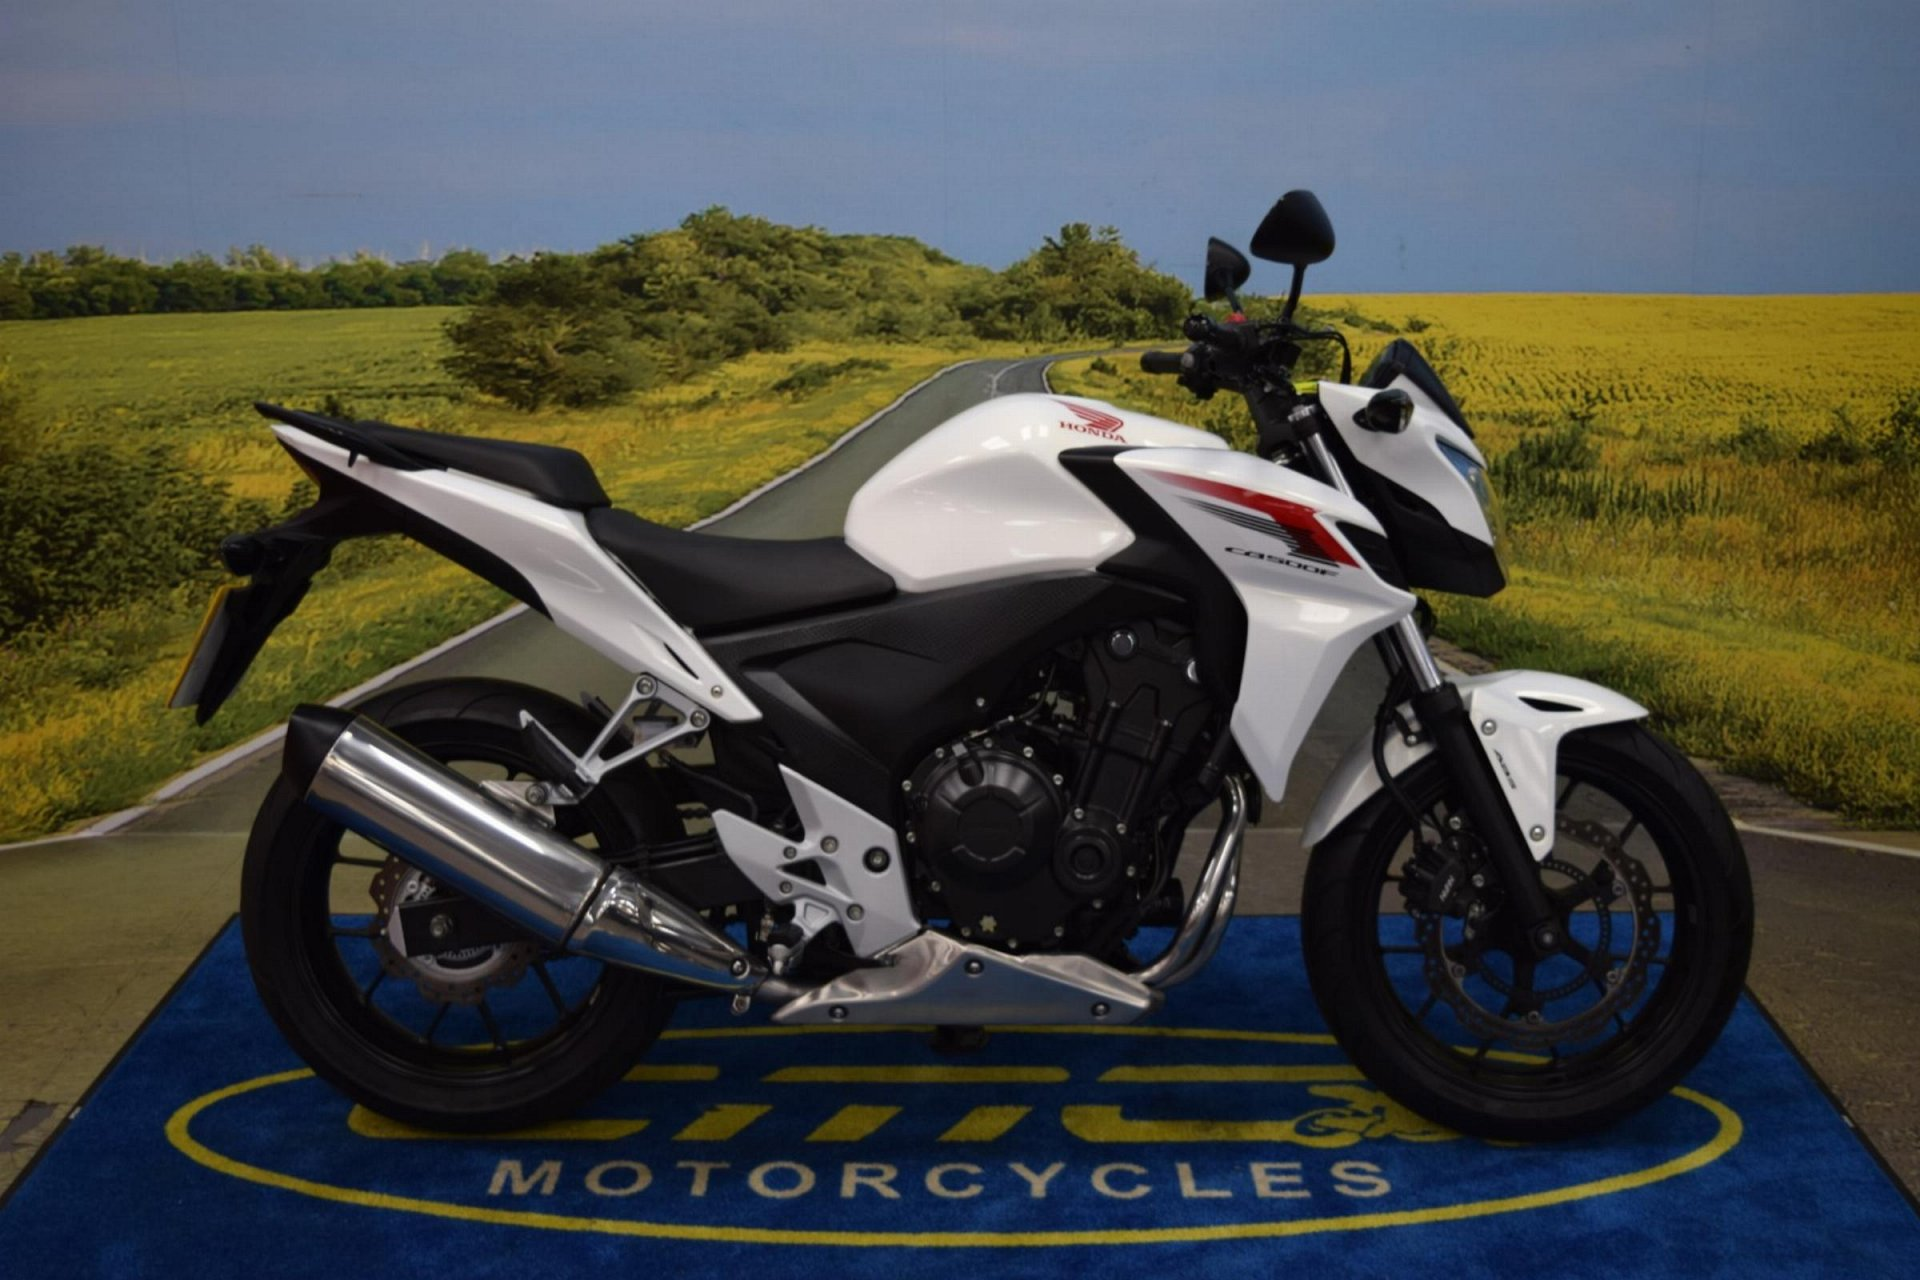 2015 Honda CB 500 for sale in Staffordshire